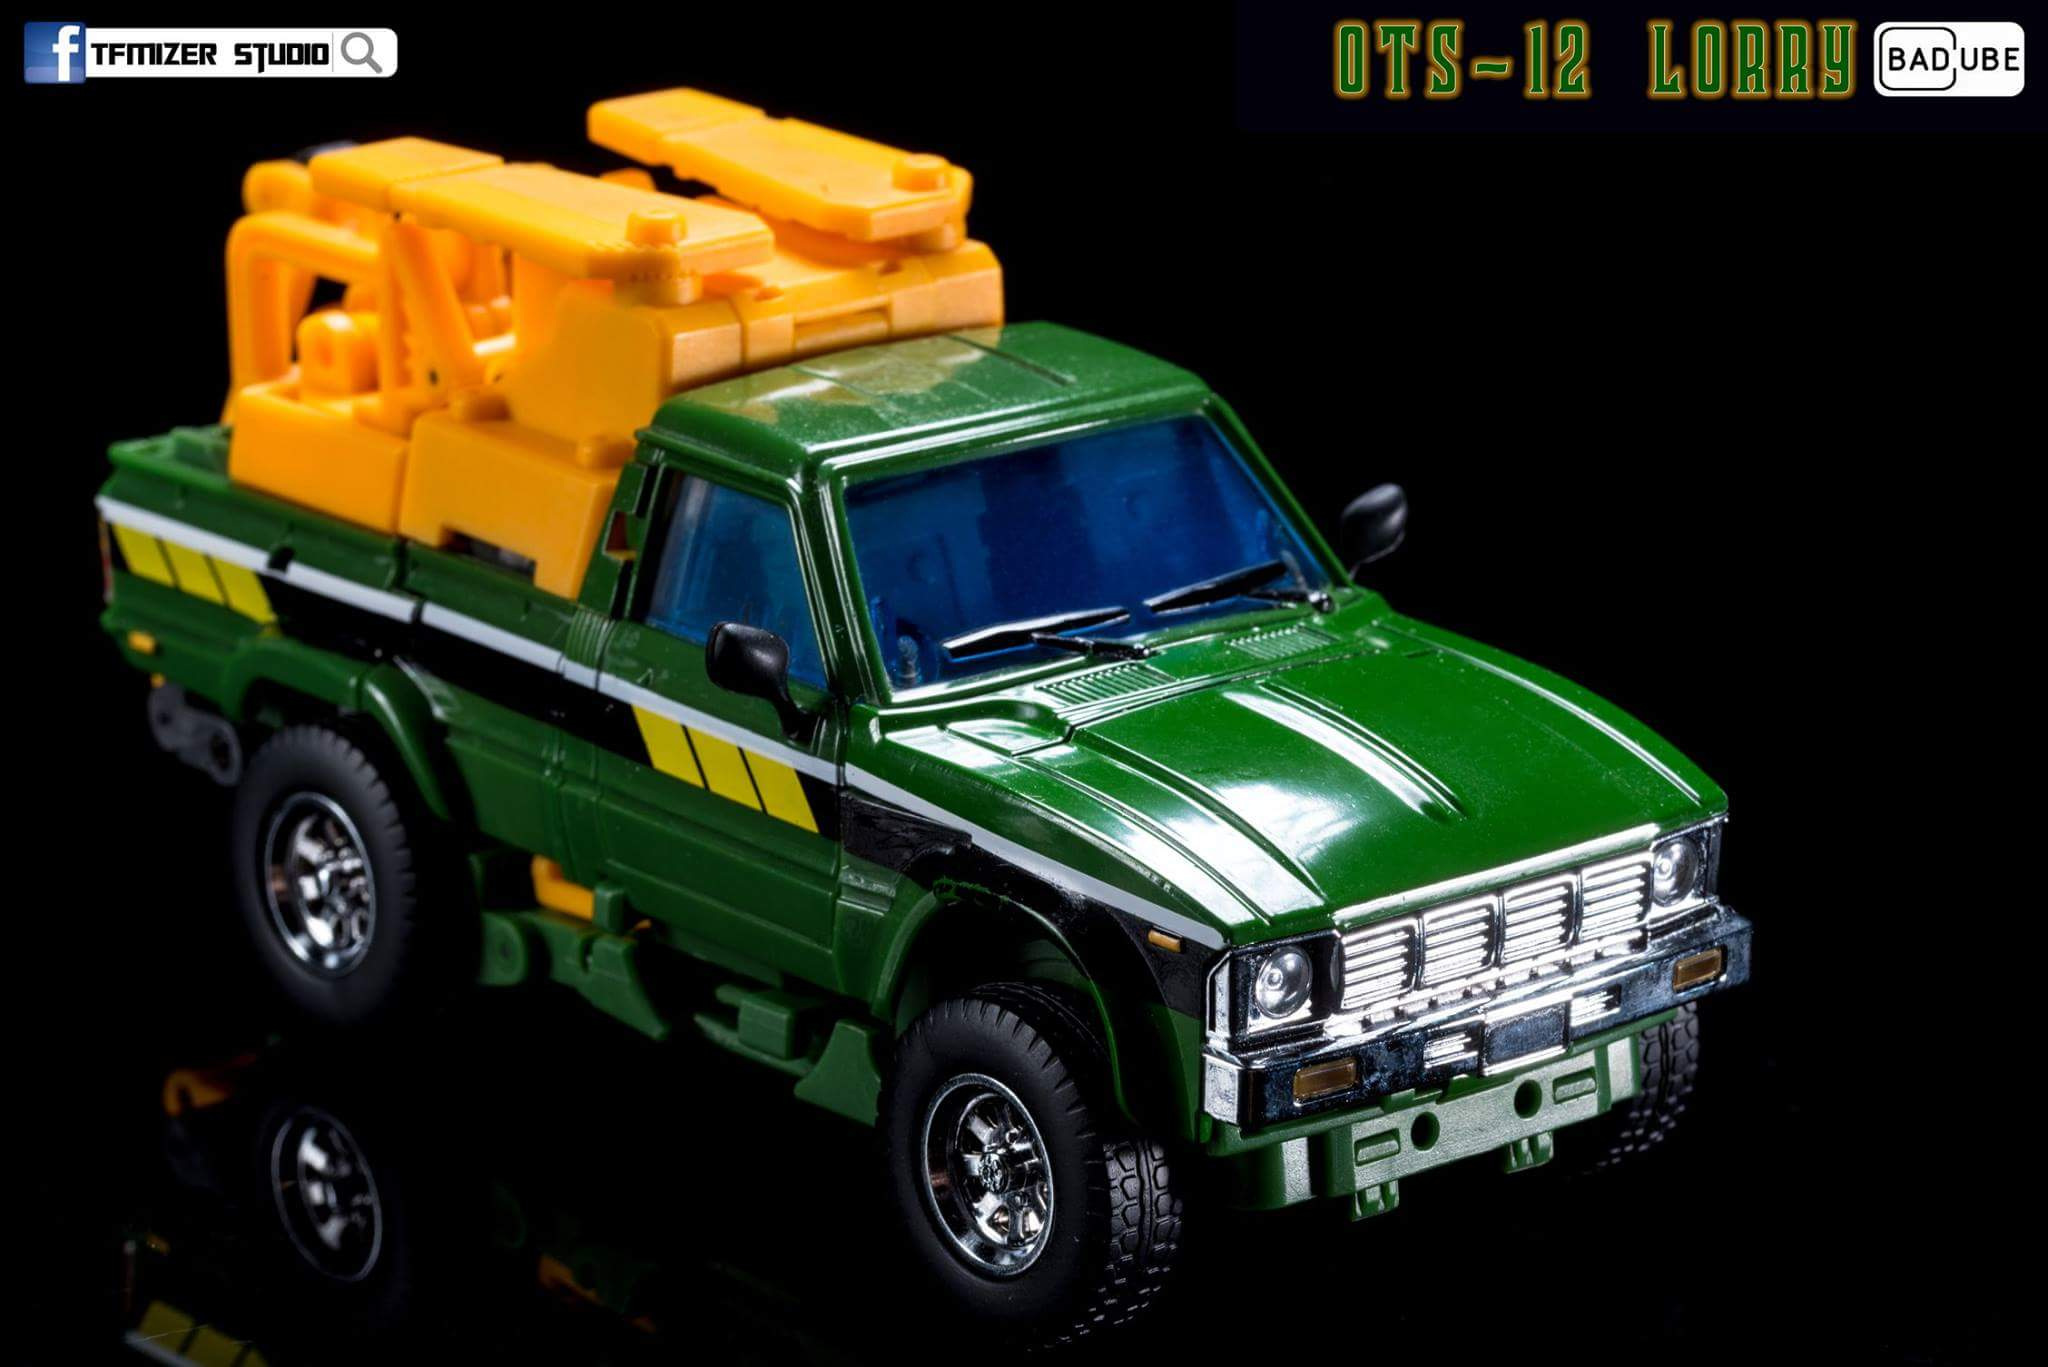 [BadCube] Produit Tiers - Jouet OTS-12 Lorry - aka Hoist/Treuil VCFX1JUh